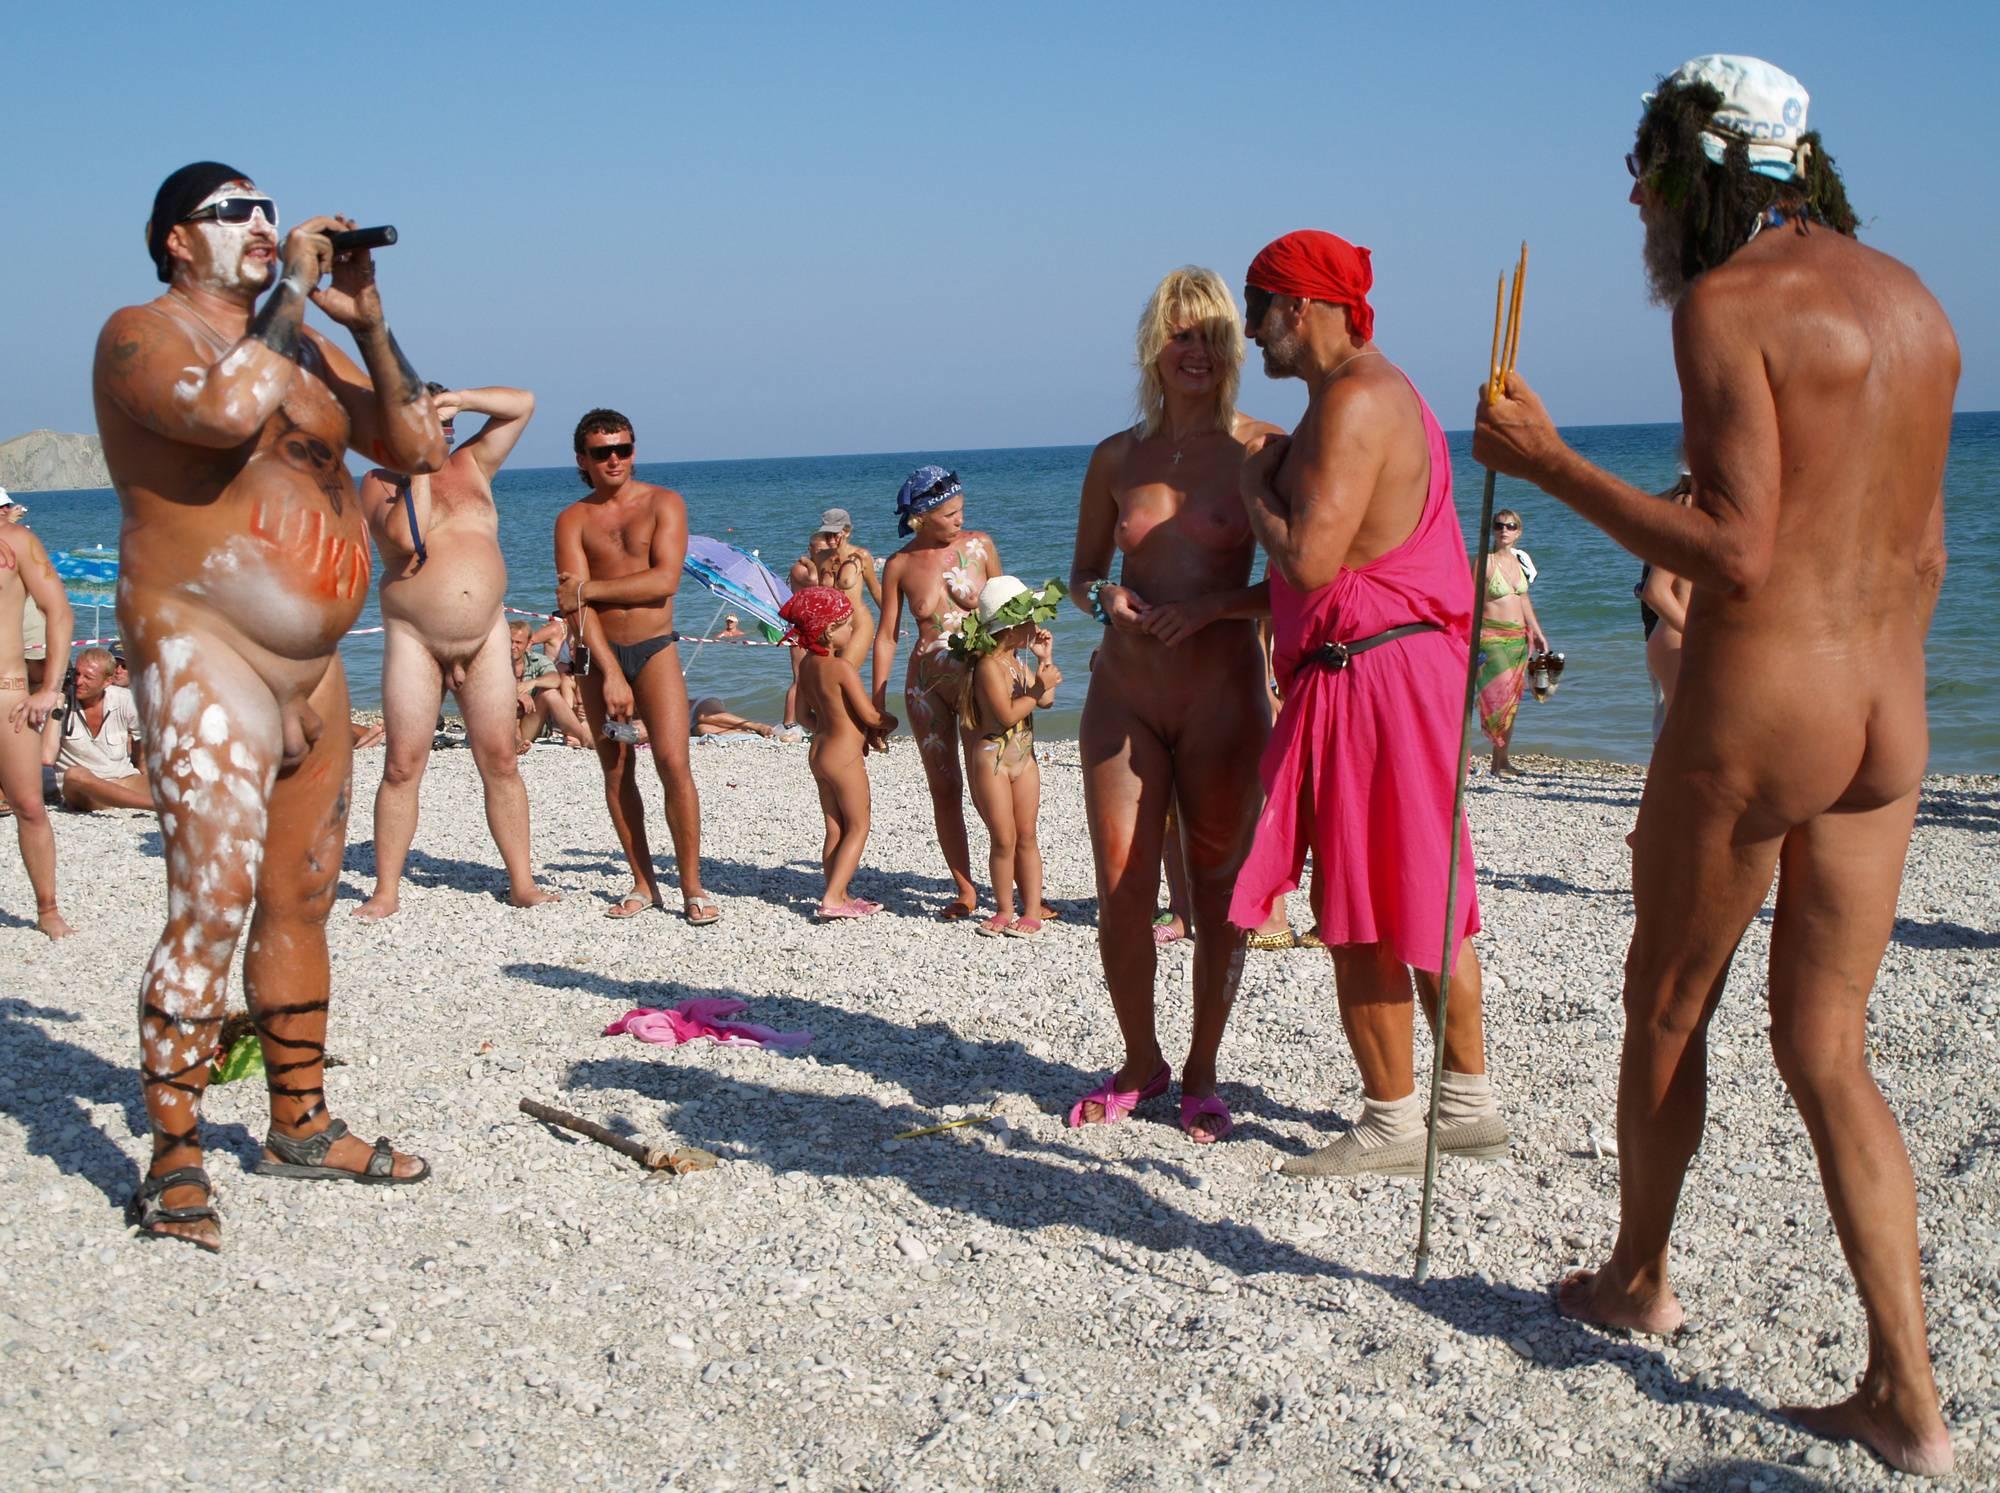 Nudist Gallery Nudist Event Introductions - 1